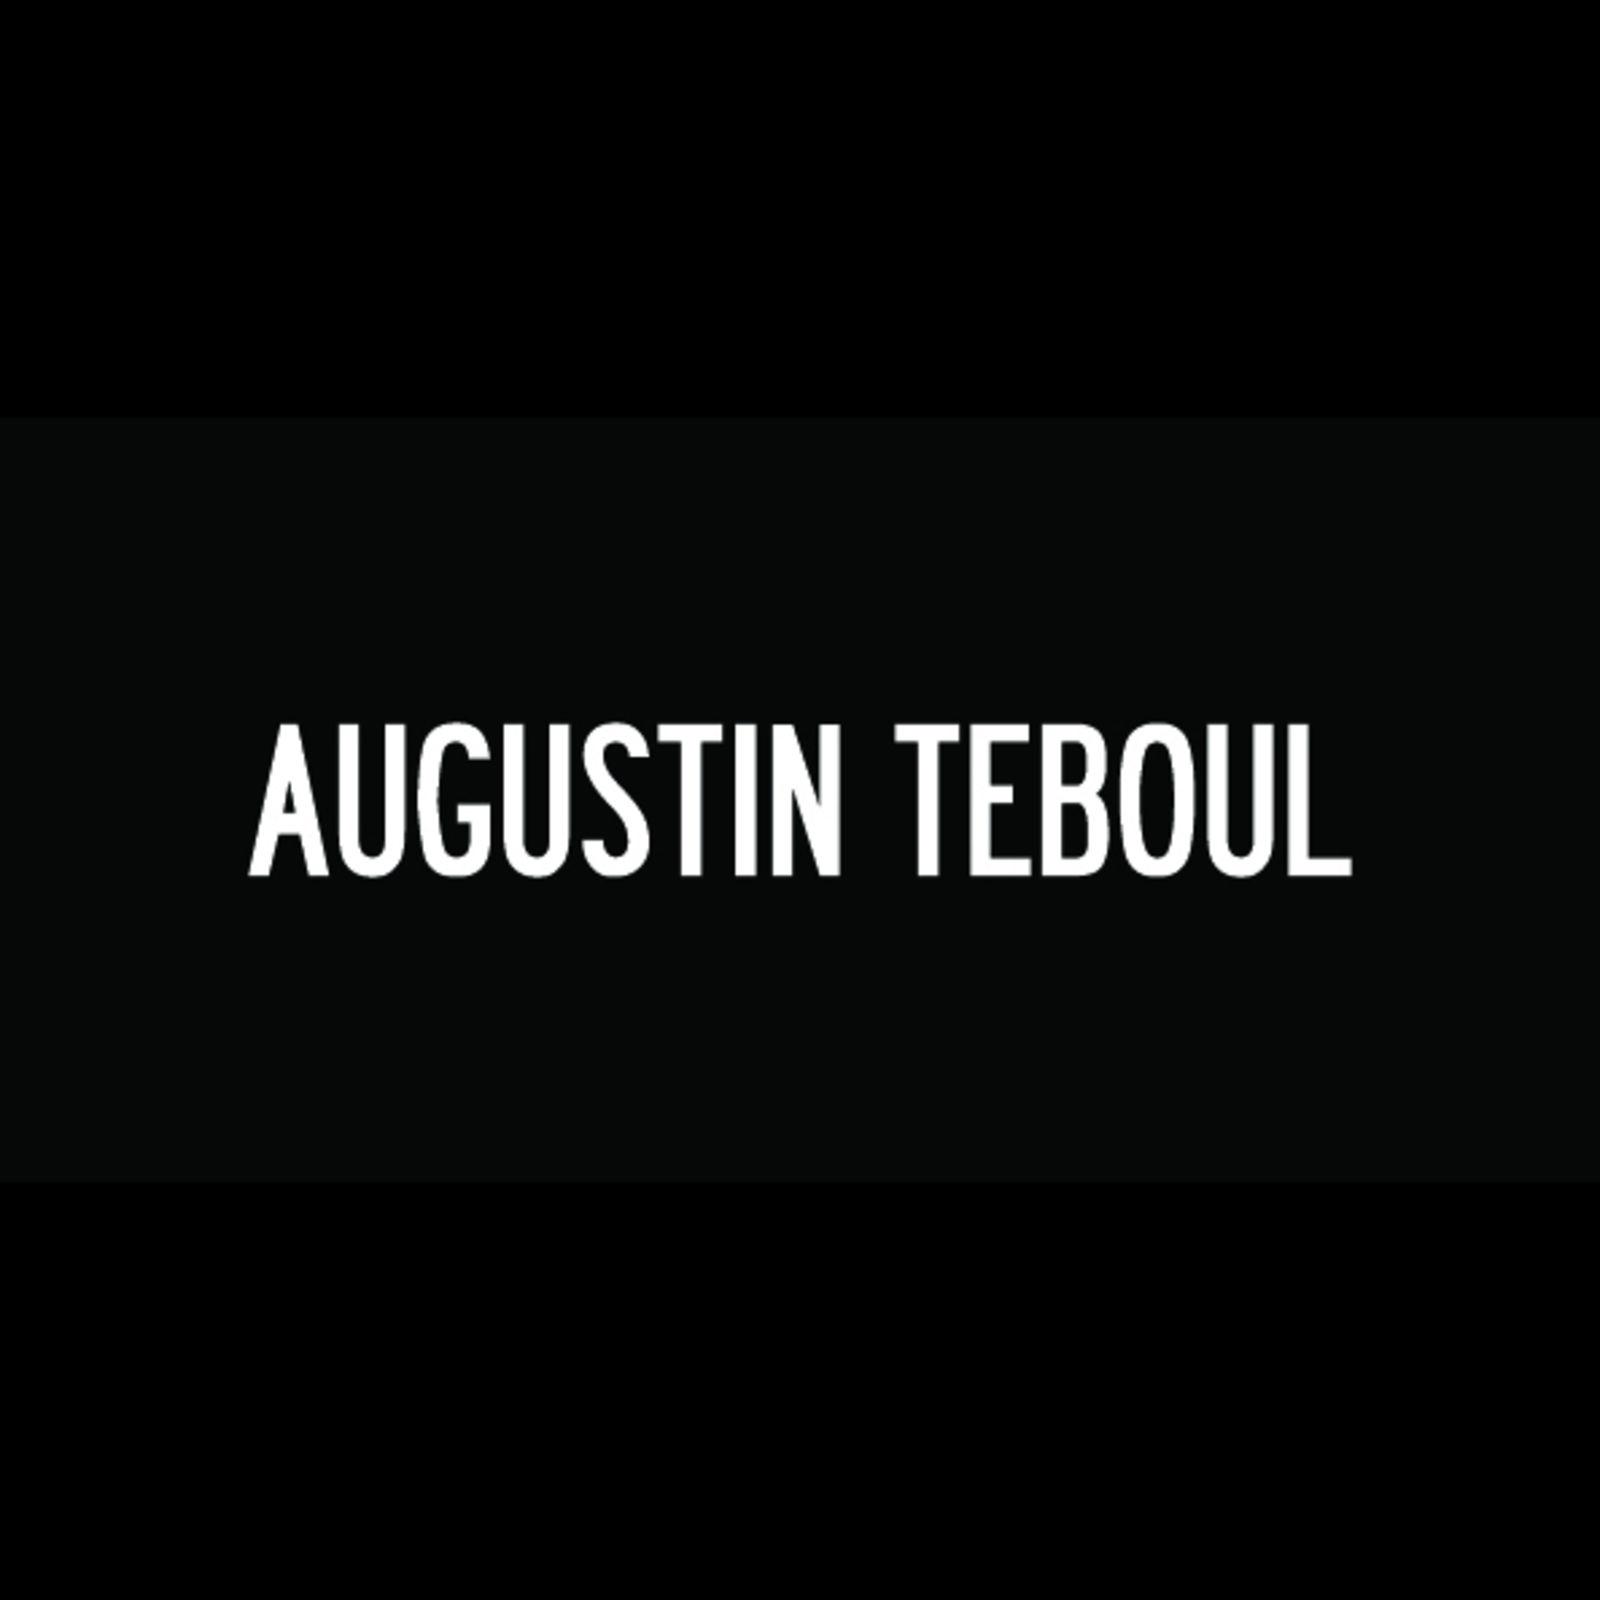 AUGUSTIN TEBOUL